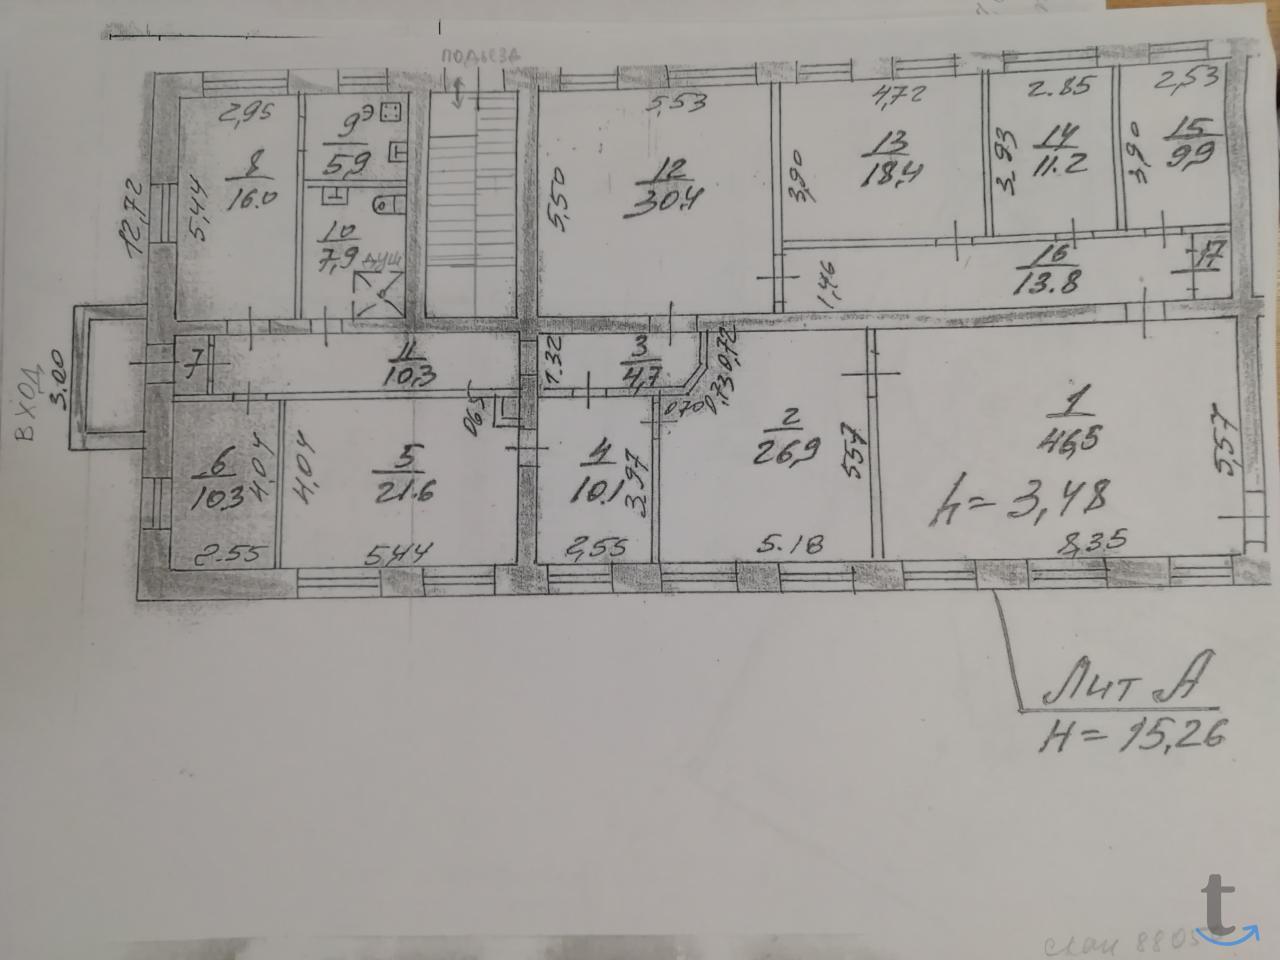 Продаю г.Ярославль, 8 комнатную квартиру 246 м кв